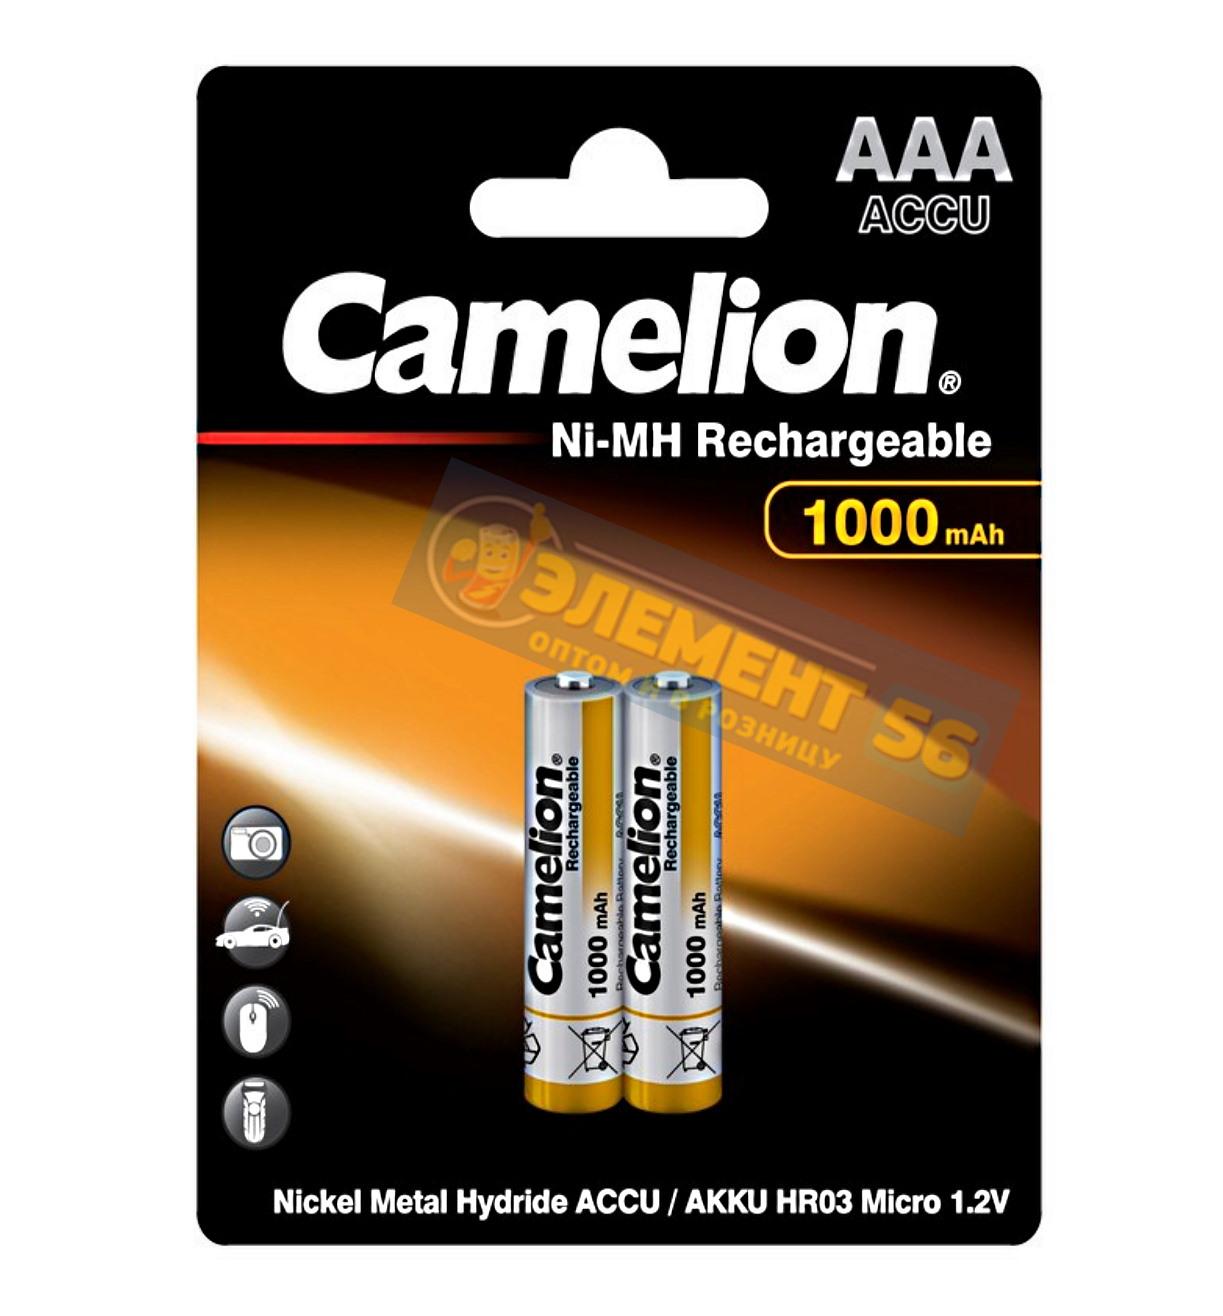 Аккумулятор CAMELION AAA, HR03 (1000 mAh) MN2400, А286, 24A, AM4, UM4, HP16 2BL (2) (24) (480)